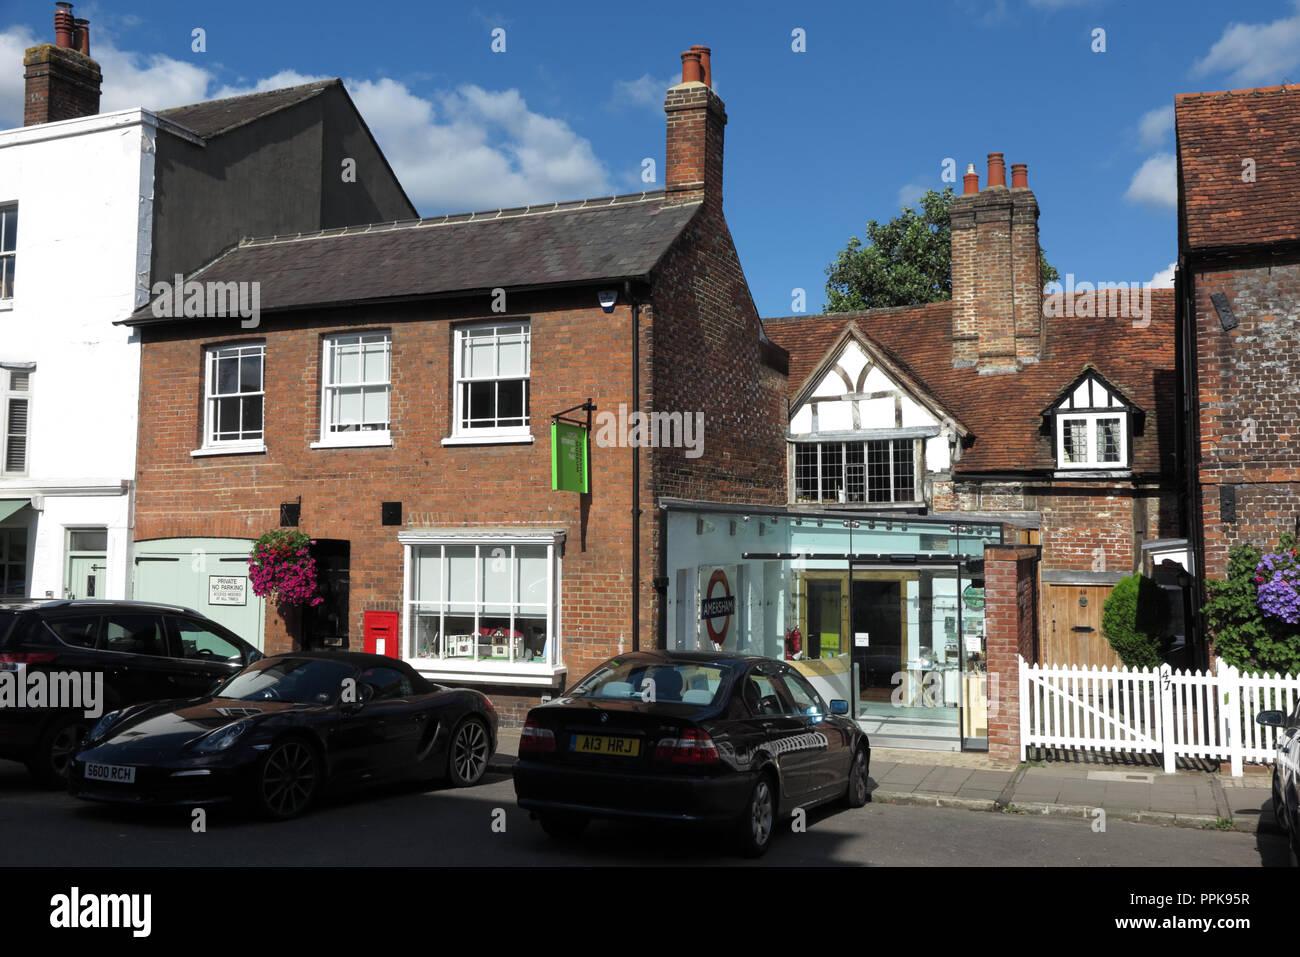 Amersham Museum, High Street, Amersham, Buckinghamshire - Stock Image